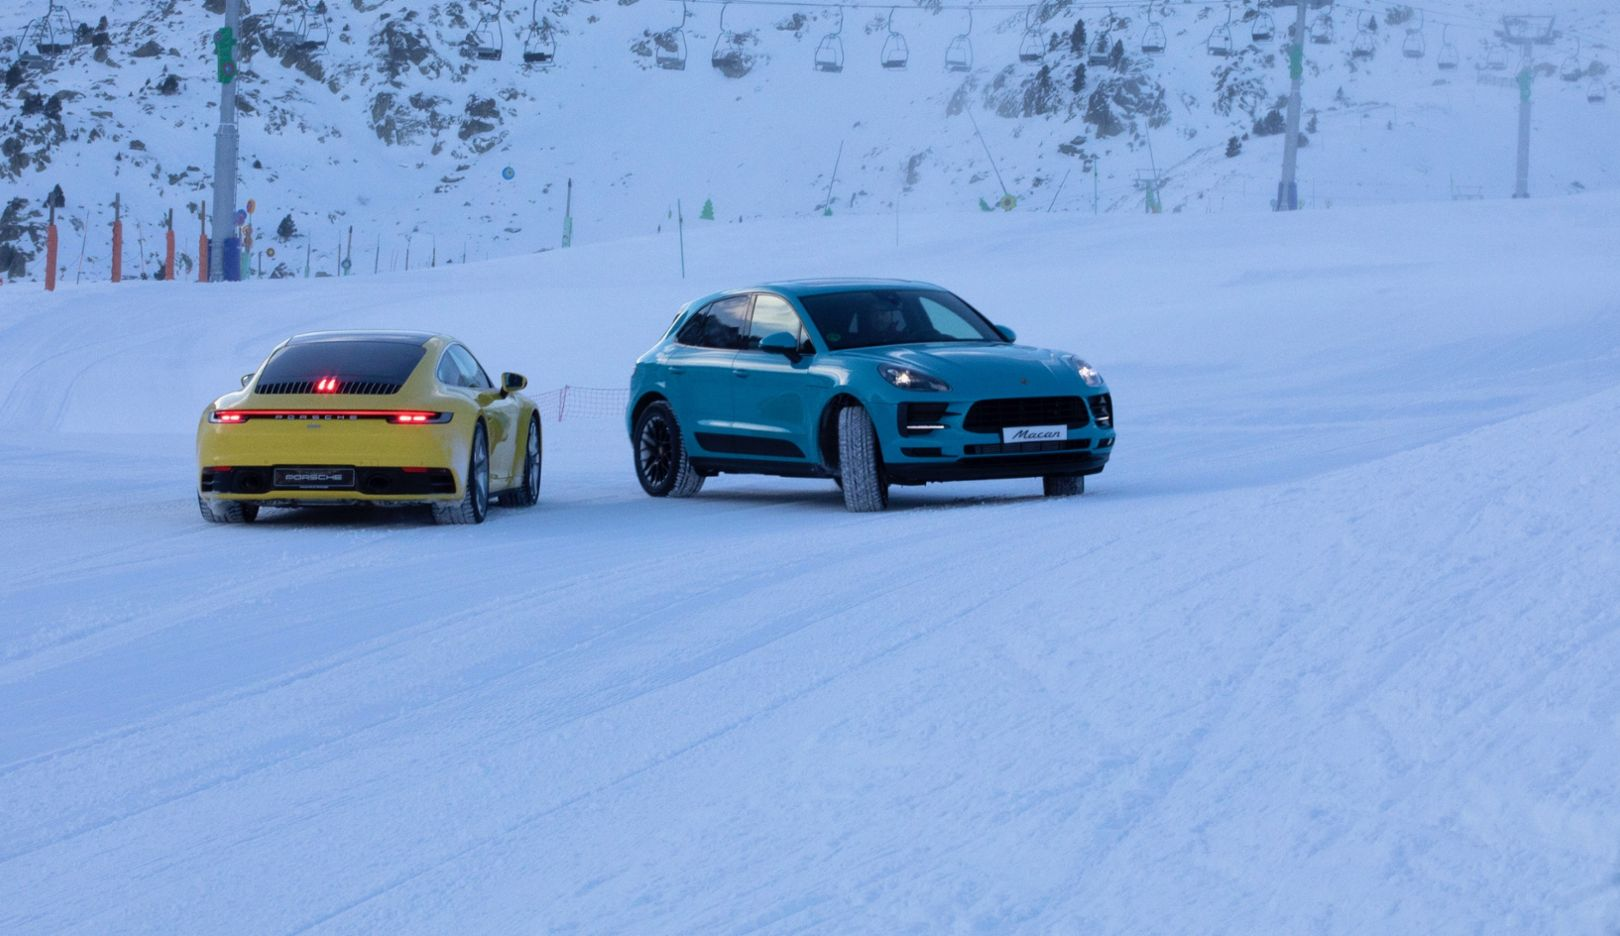 A ski day with Porsche